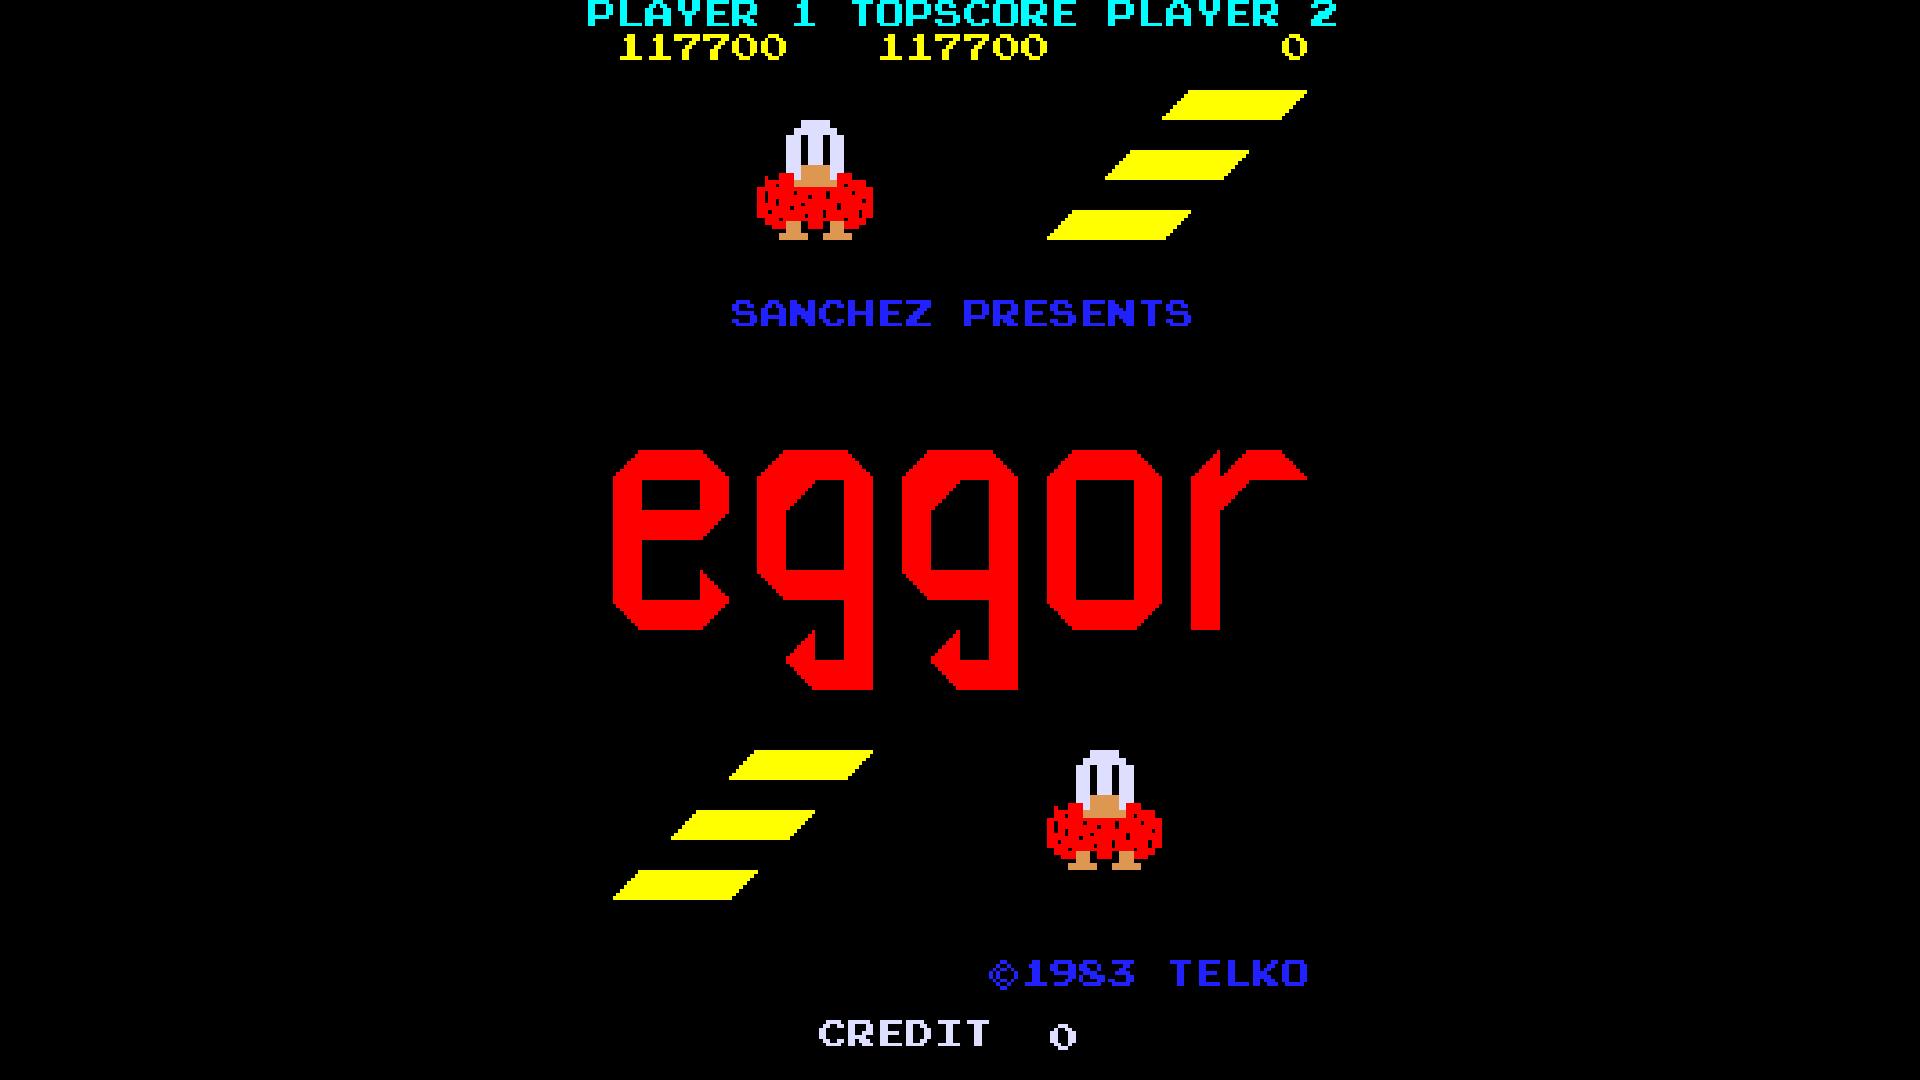 Eggor [eggor] 117,700 points